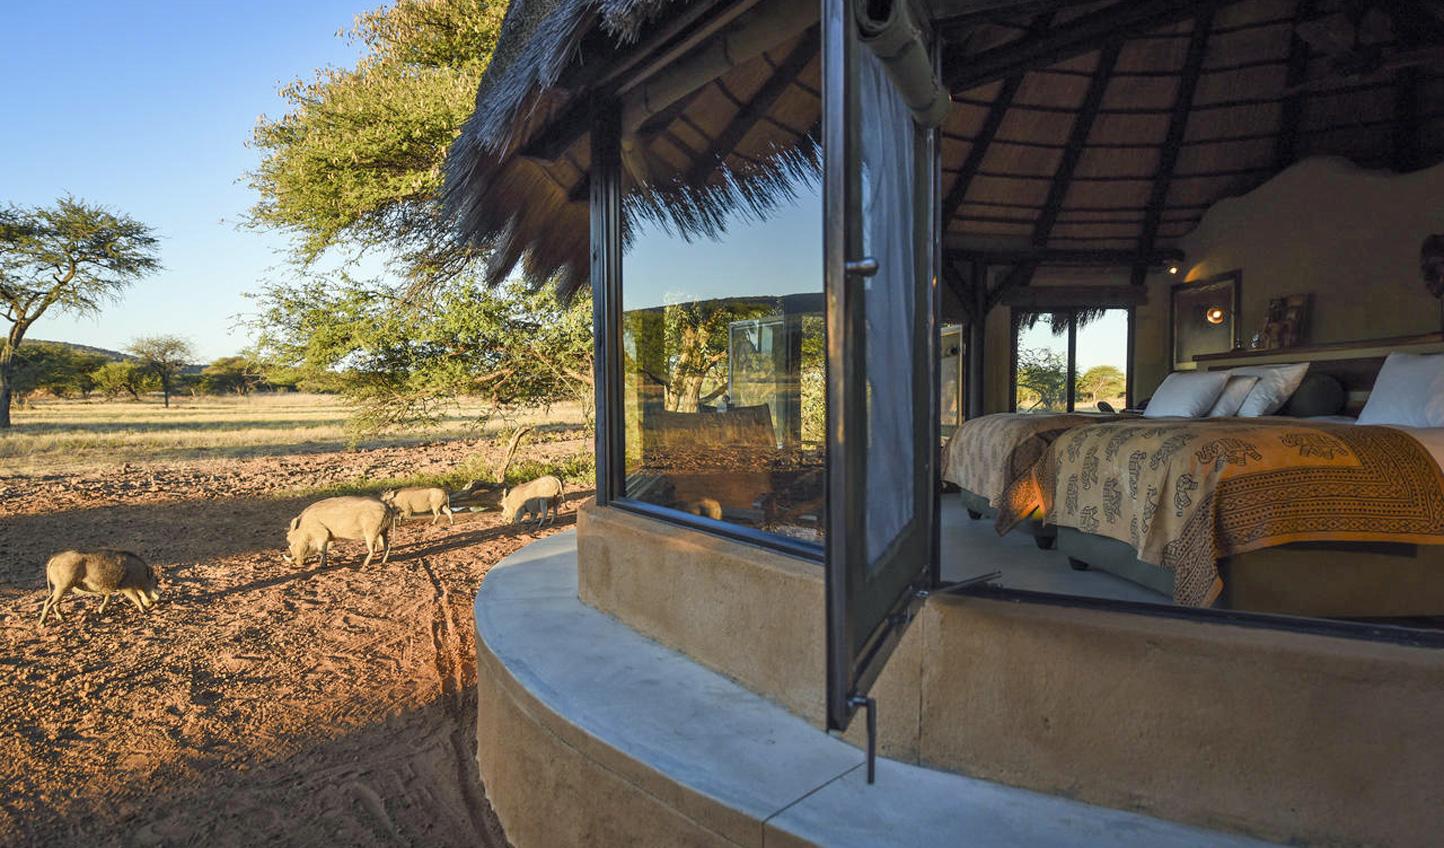 Spend one last night in luxury at Okonjima Luxury Bush Camp